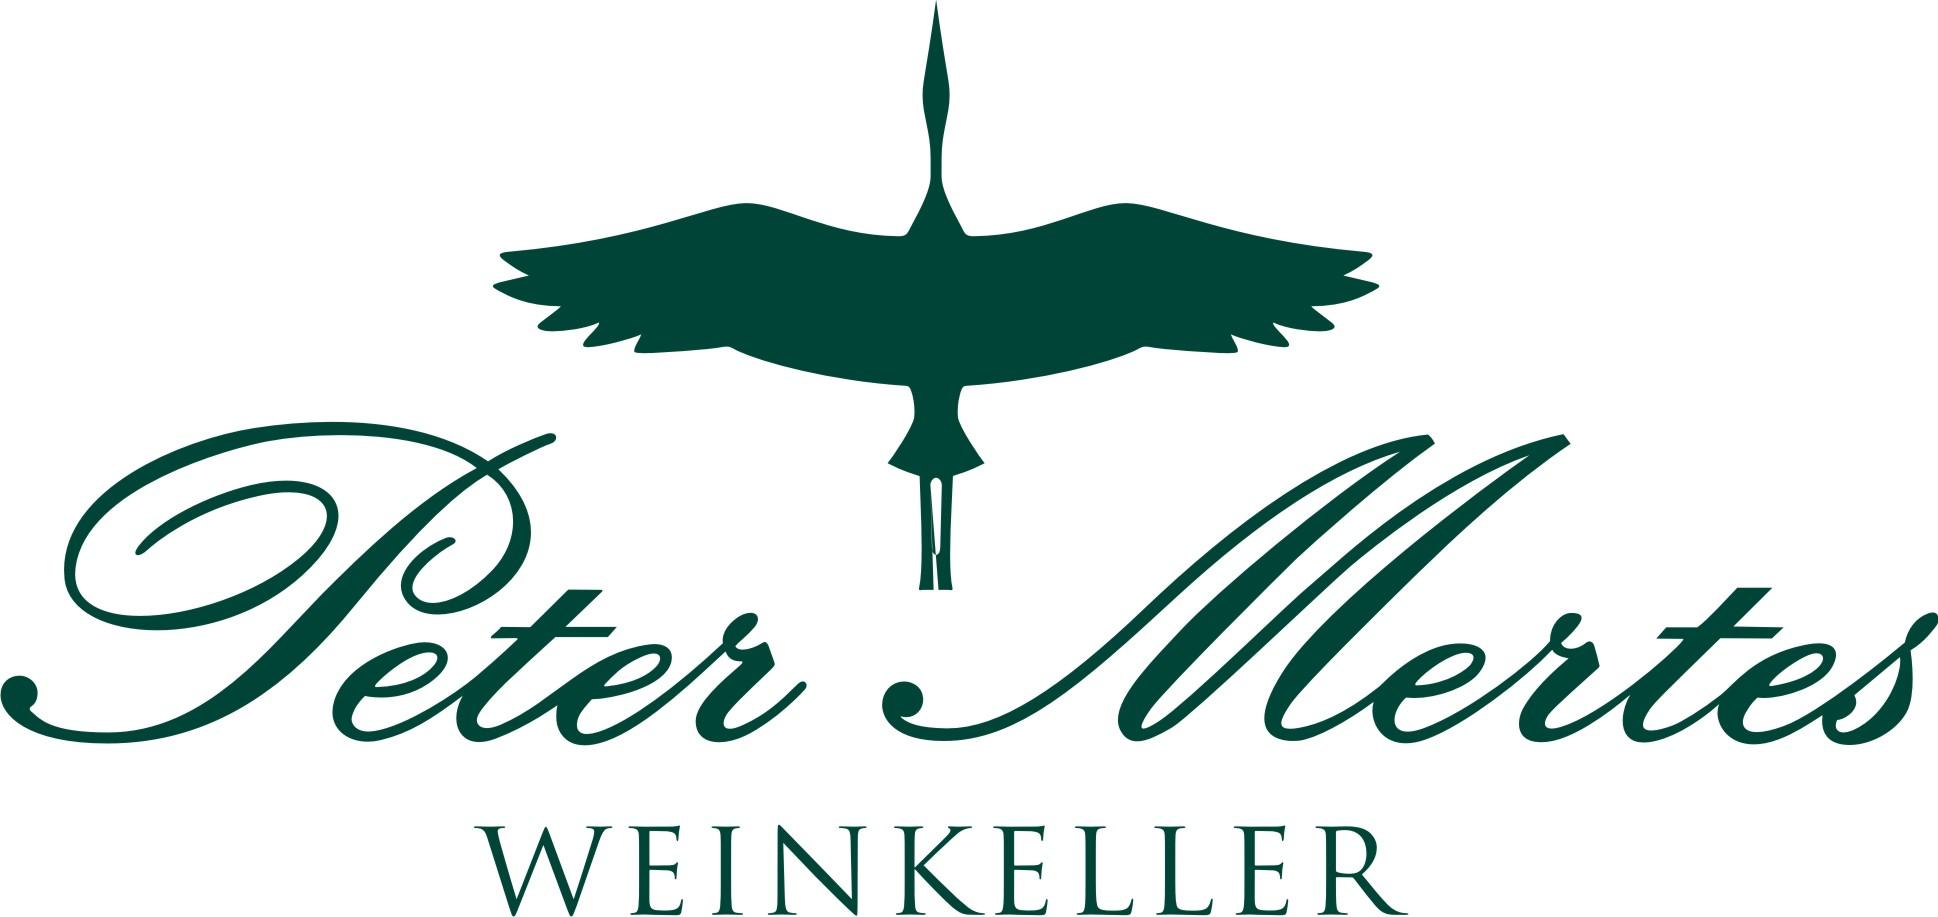 Peter Mertes KG Weinkellerei